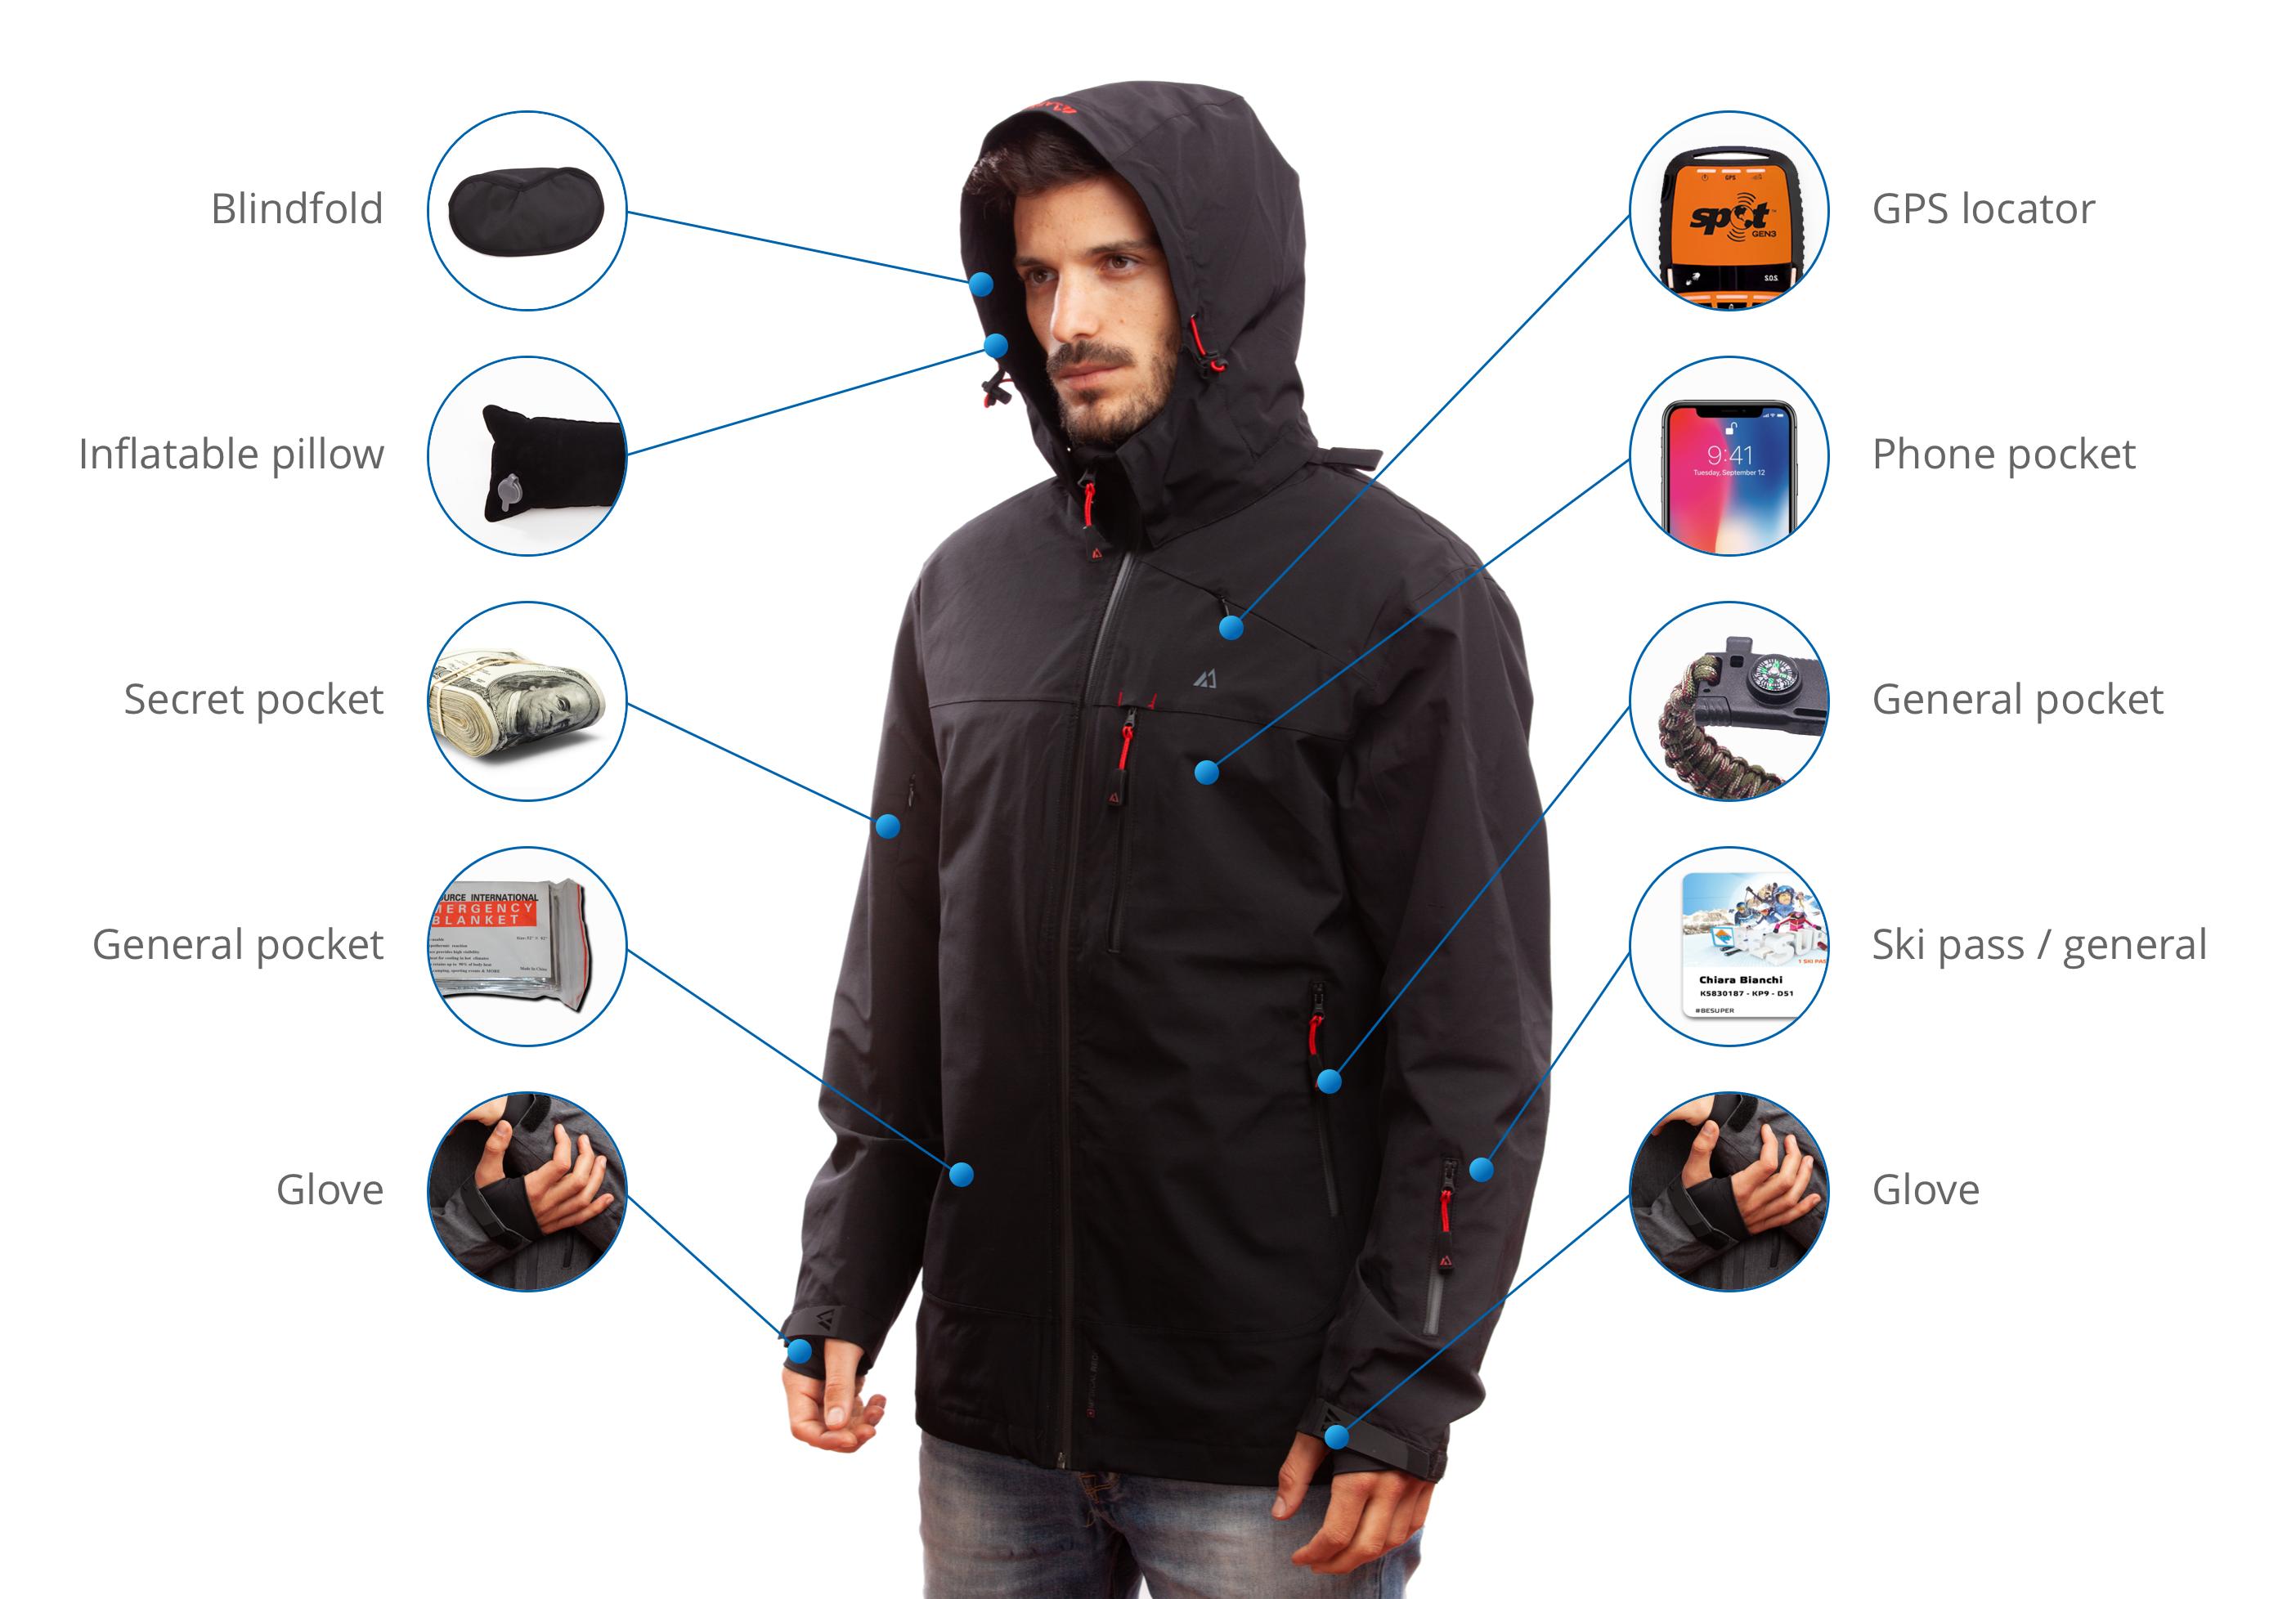 Men S Jacket Fully Loaded With Gps Bundle Apricoat Mens Jackets Jackets Travel Jacket [ 1956 x 2808 Pixel ]